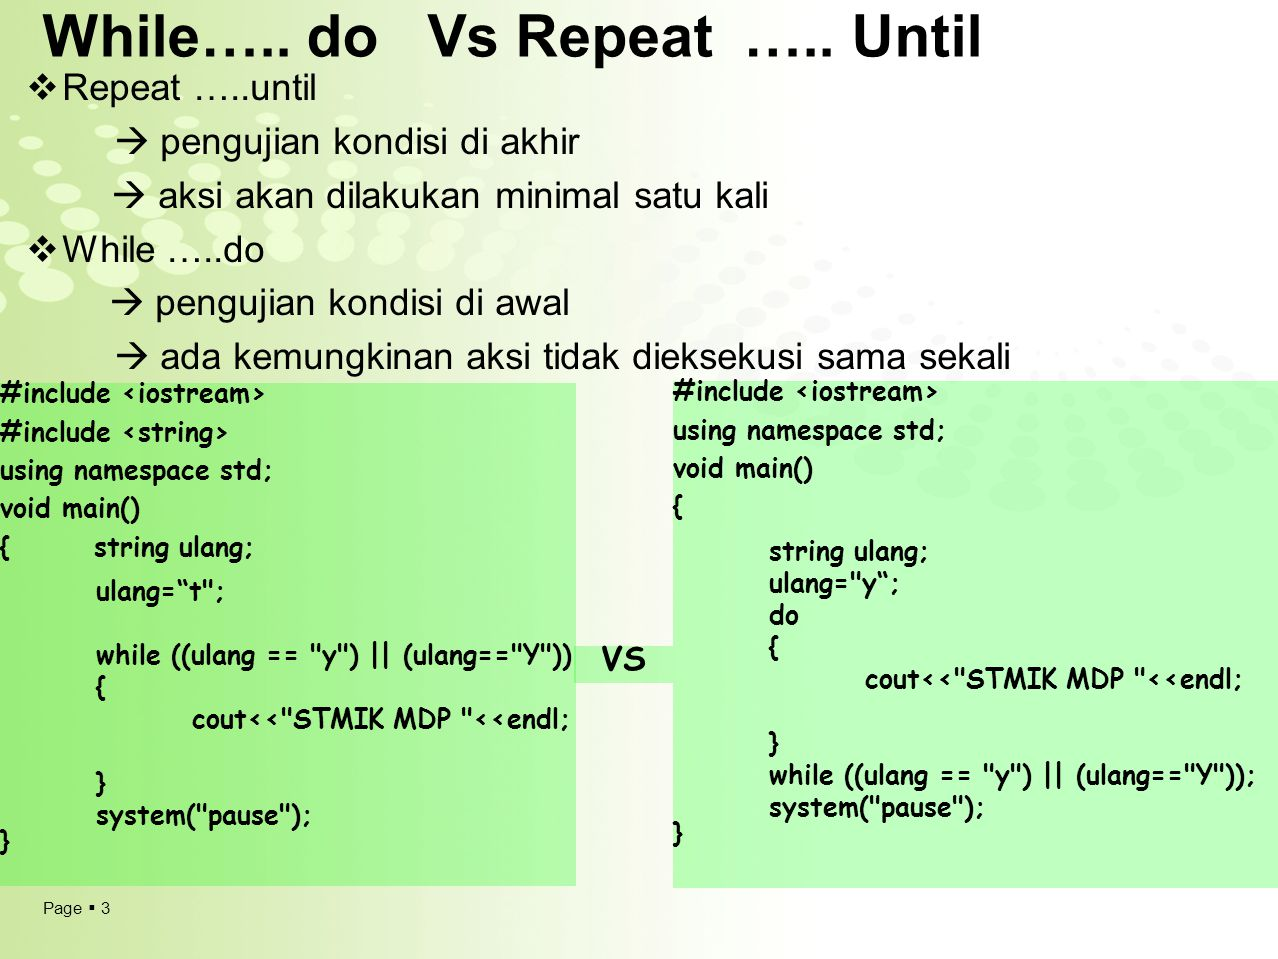 Page  14 Example Prosedur dengan Parameter Output Procedure HitungRataRata (input n :integer, output u : real) {Menghitung rata-rata dengan parameter output } Deklarasi x : integer k : integer jumlah : integer Deskripsi jumlah  0 for k  1 to N do read(x) jumlah  jumlah +x end for u  jumlah/N Algoritma RataRataBilanganBulat {program utama} Deklarasi Procedure HitungRataRata (input n :integer, output u : real) Ndata : integer Rata : real Deskripsi read(Ndata) HitungRataRata(Ndata,Rata) write(rata)